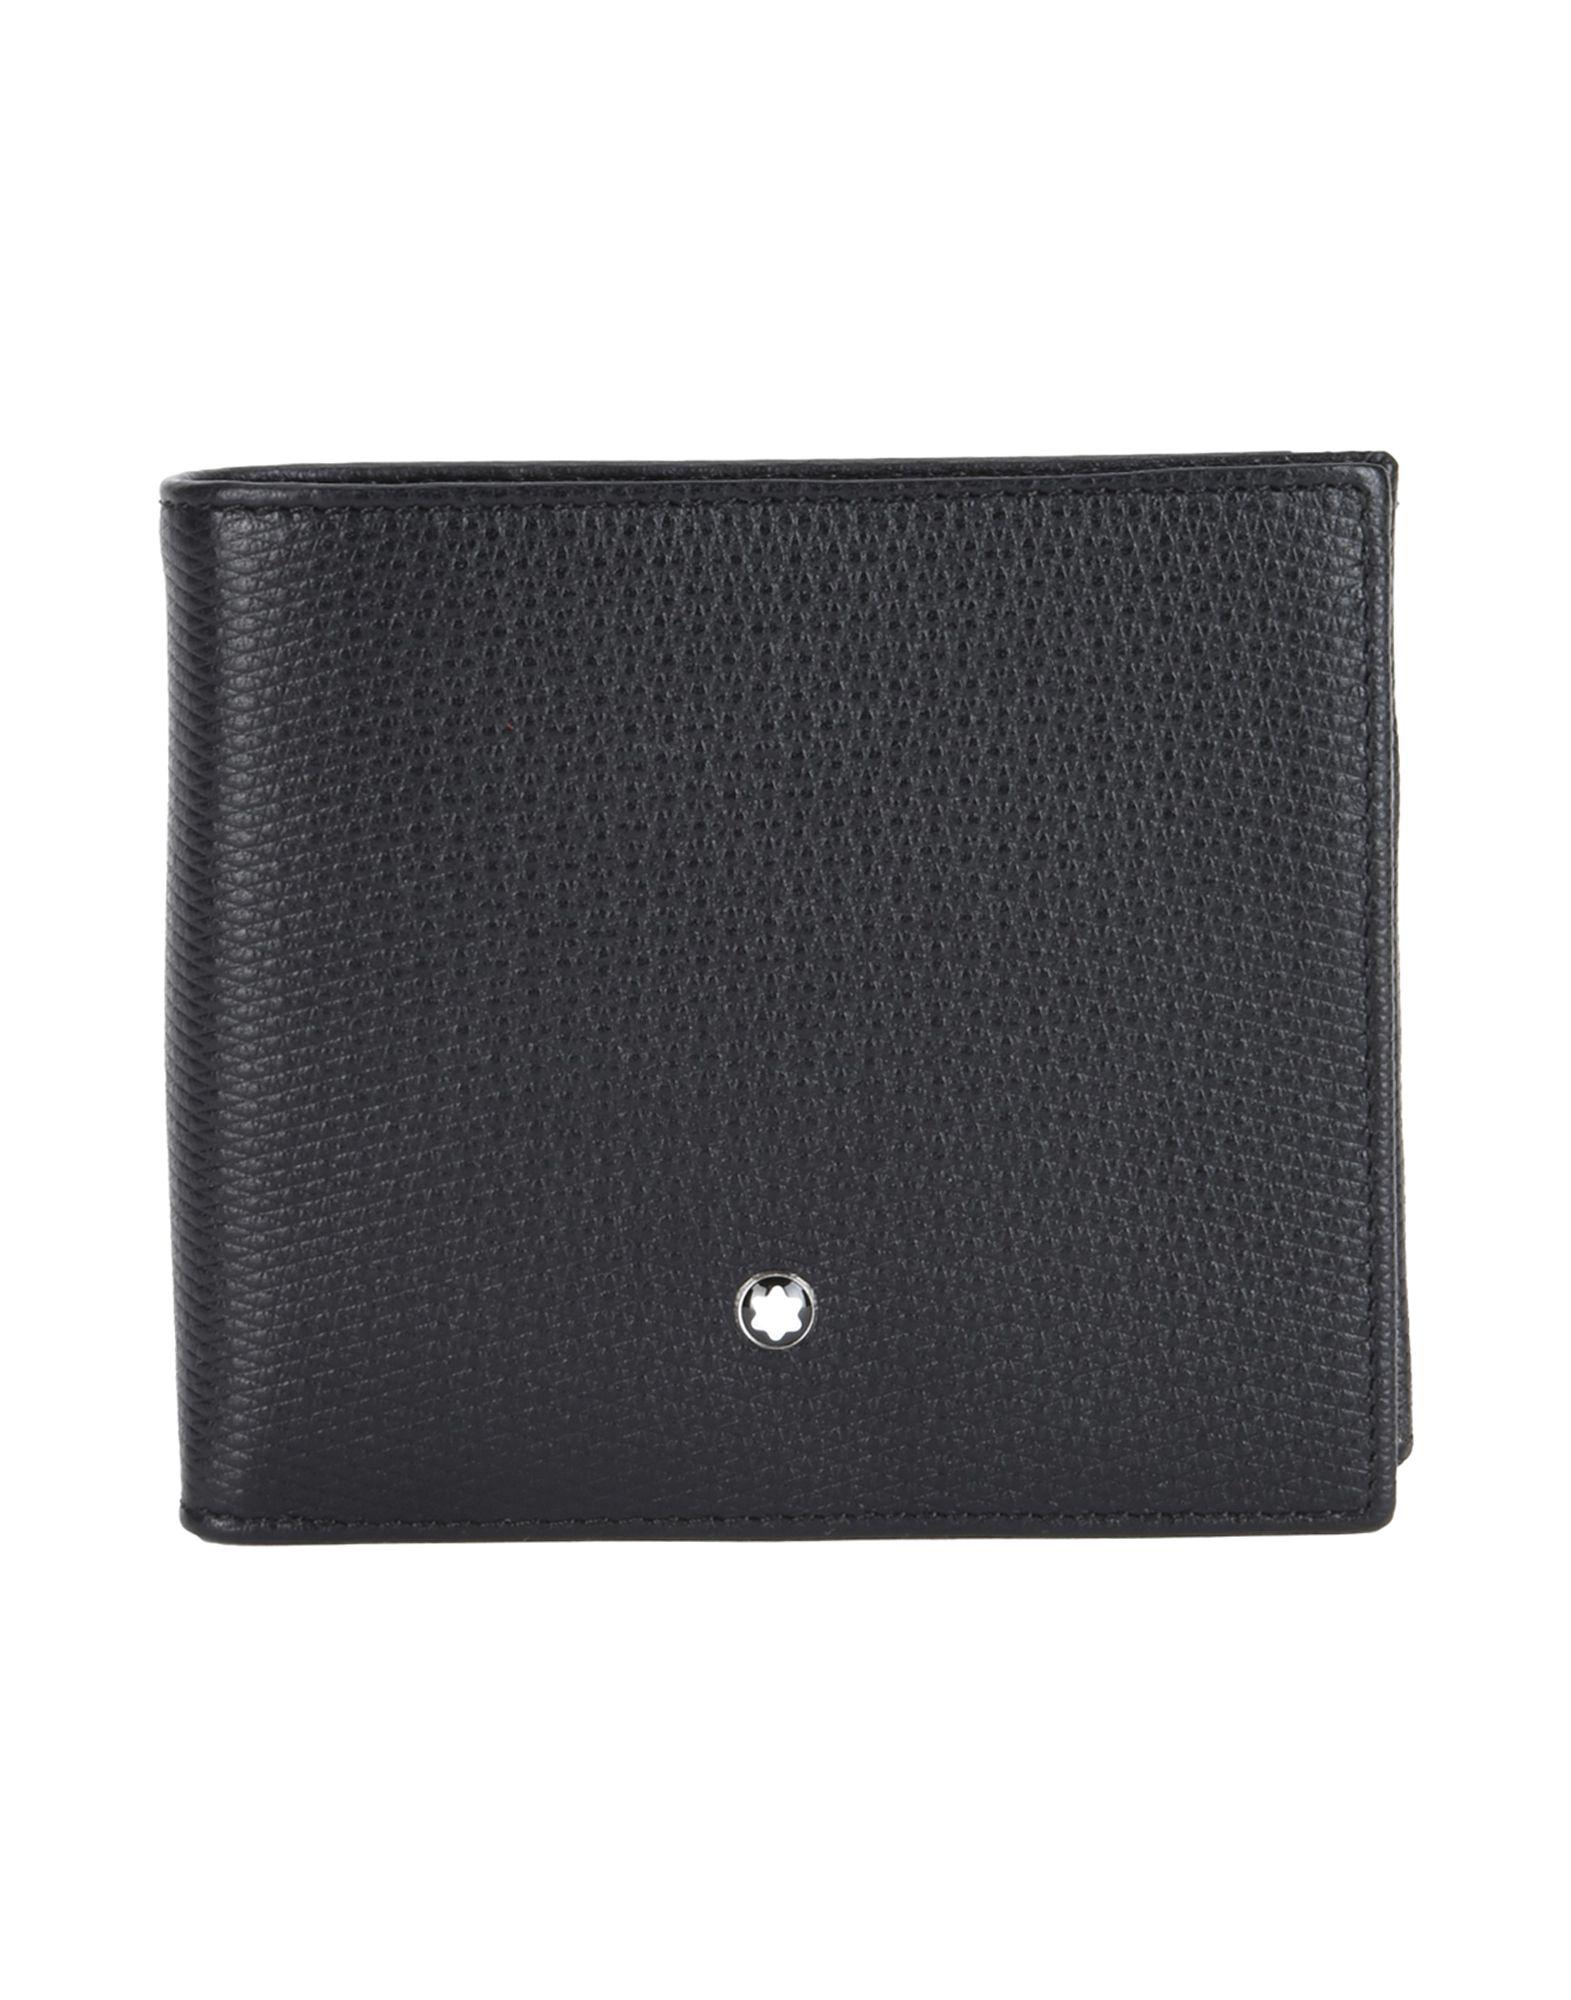 Portafoglio Montblanc Unicef_Wallet 4 Cc With Coin Case - Uomo - Acquista online su